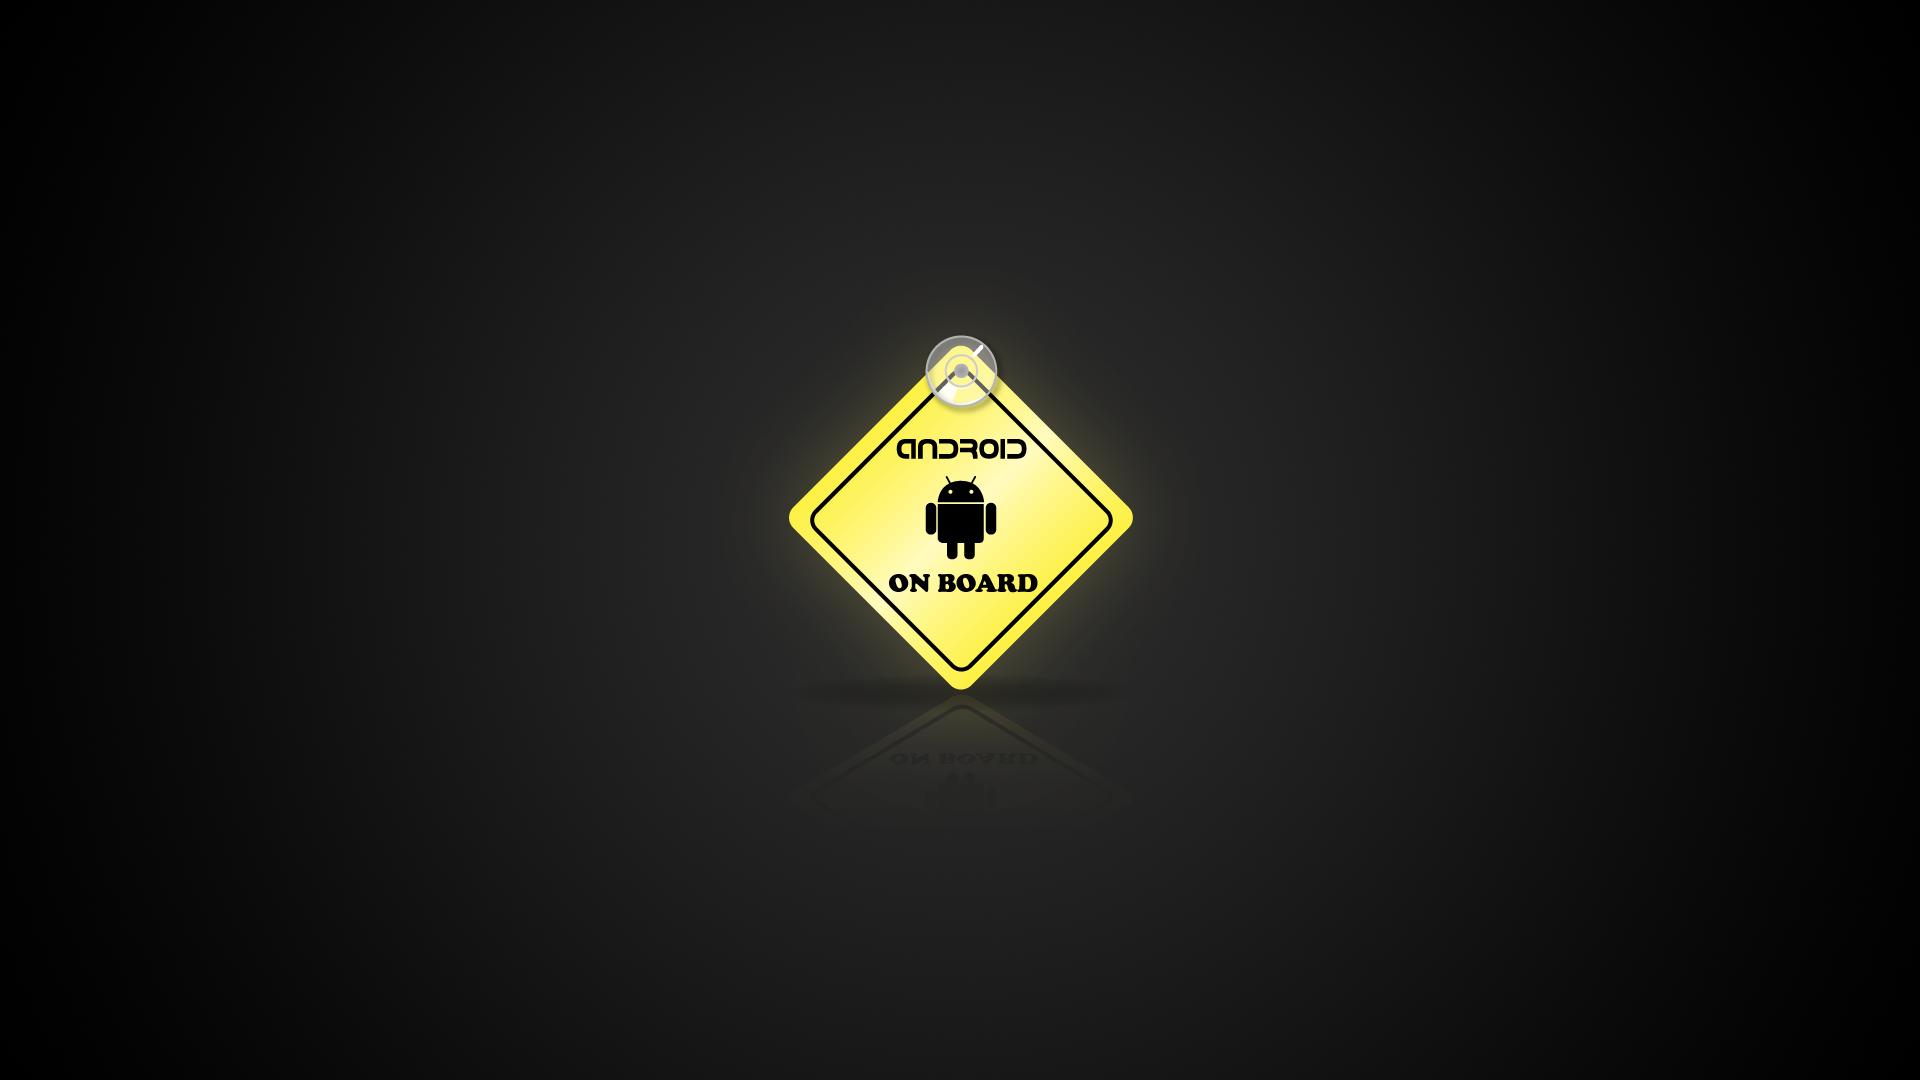 free black wallpaper Android Black Wallpaper 1920x1080